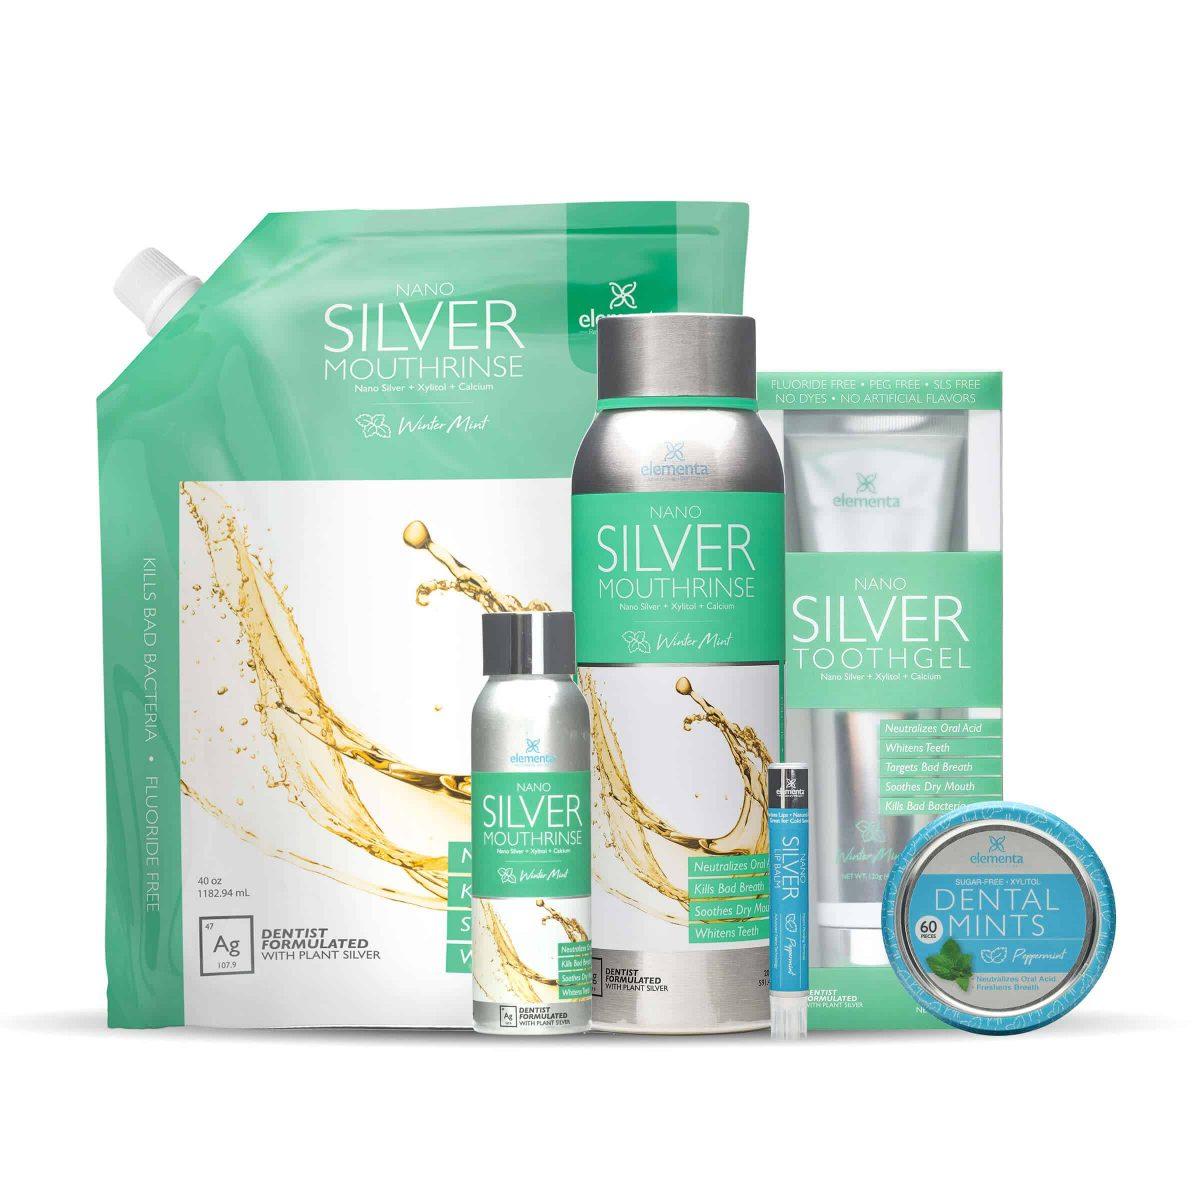 nano silver mouth rinse full routine winter mint peppermint bundle